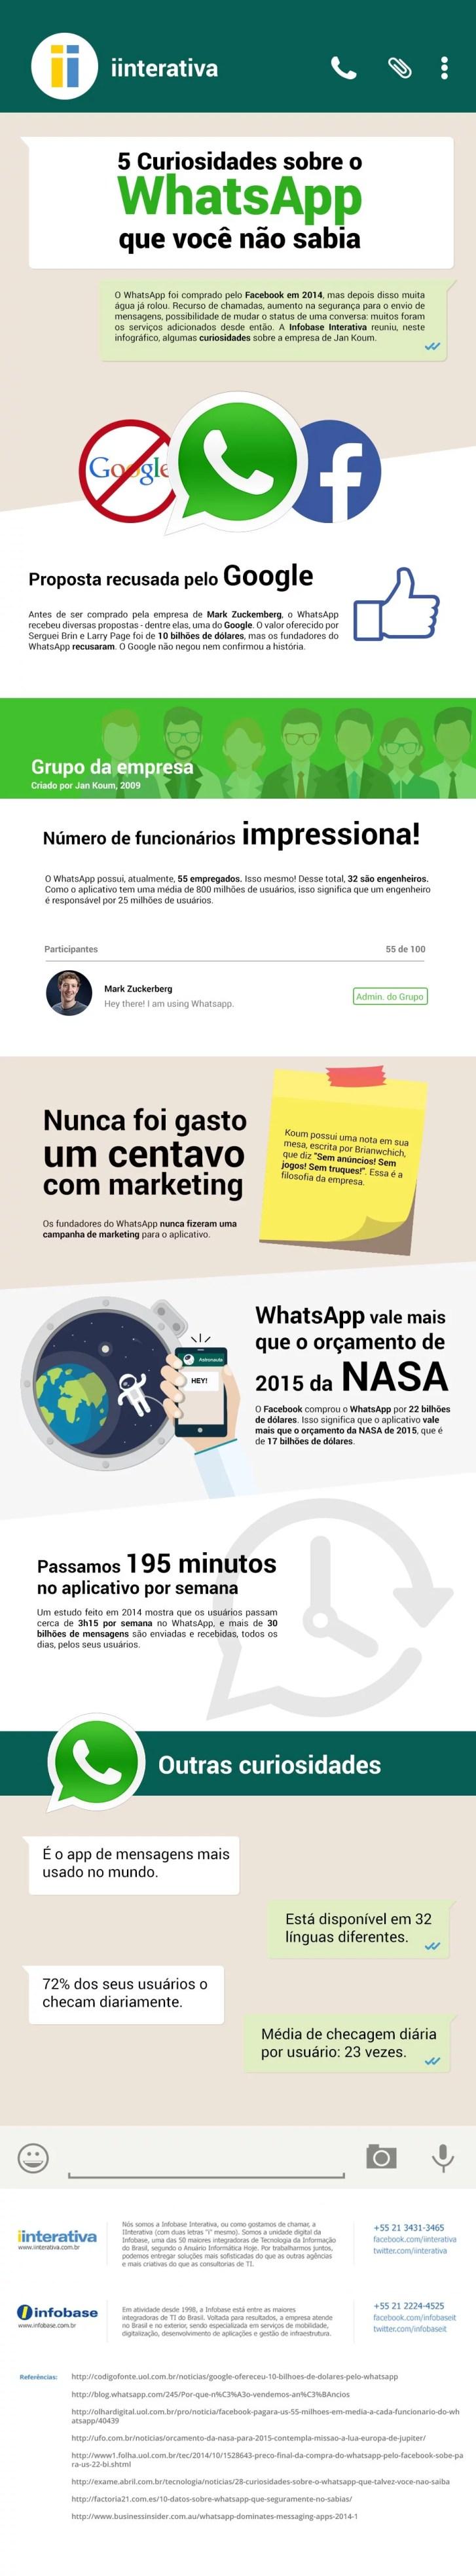 Infográfico Curiosidade sobre o WhatsApp